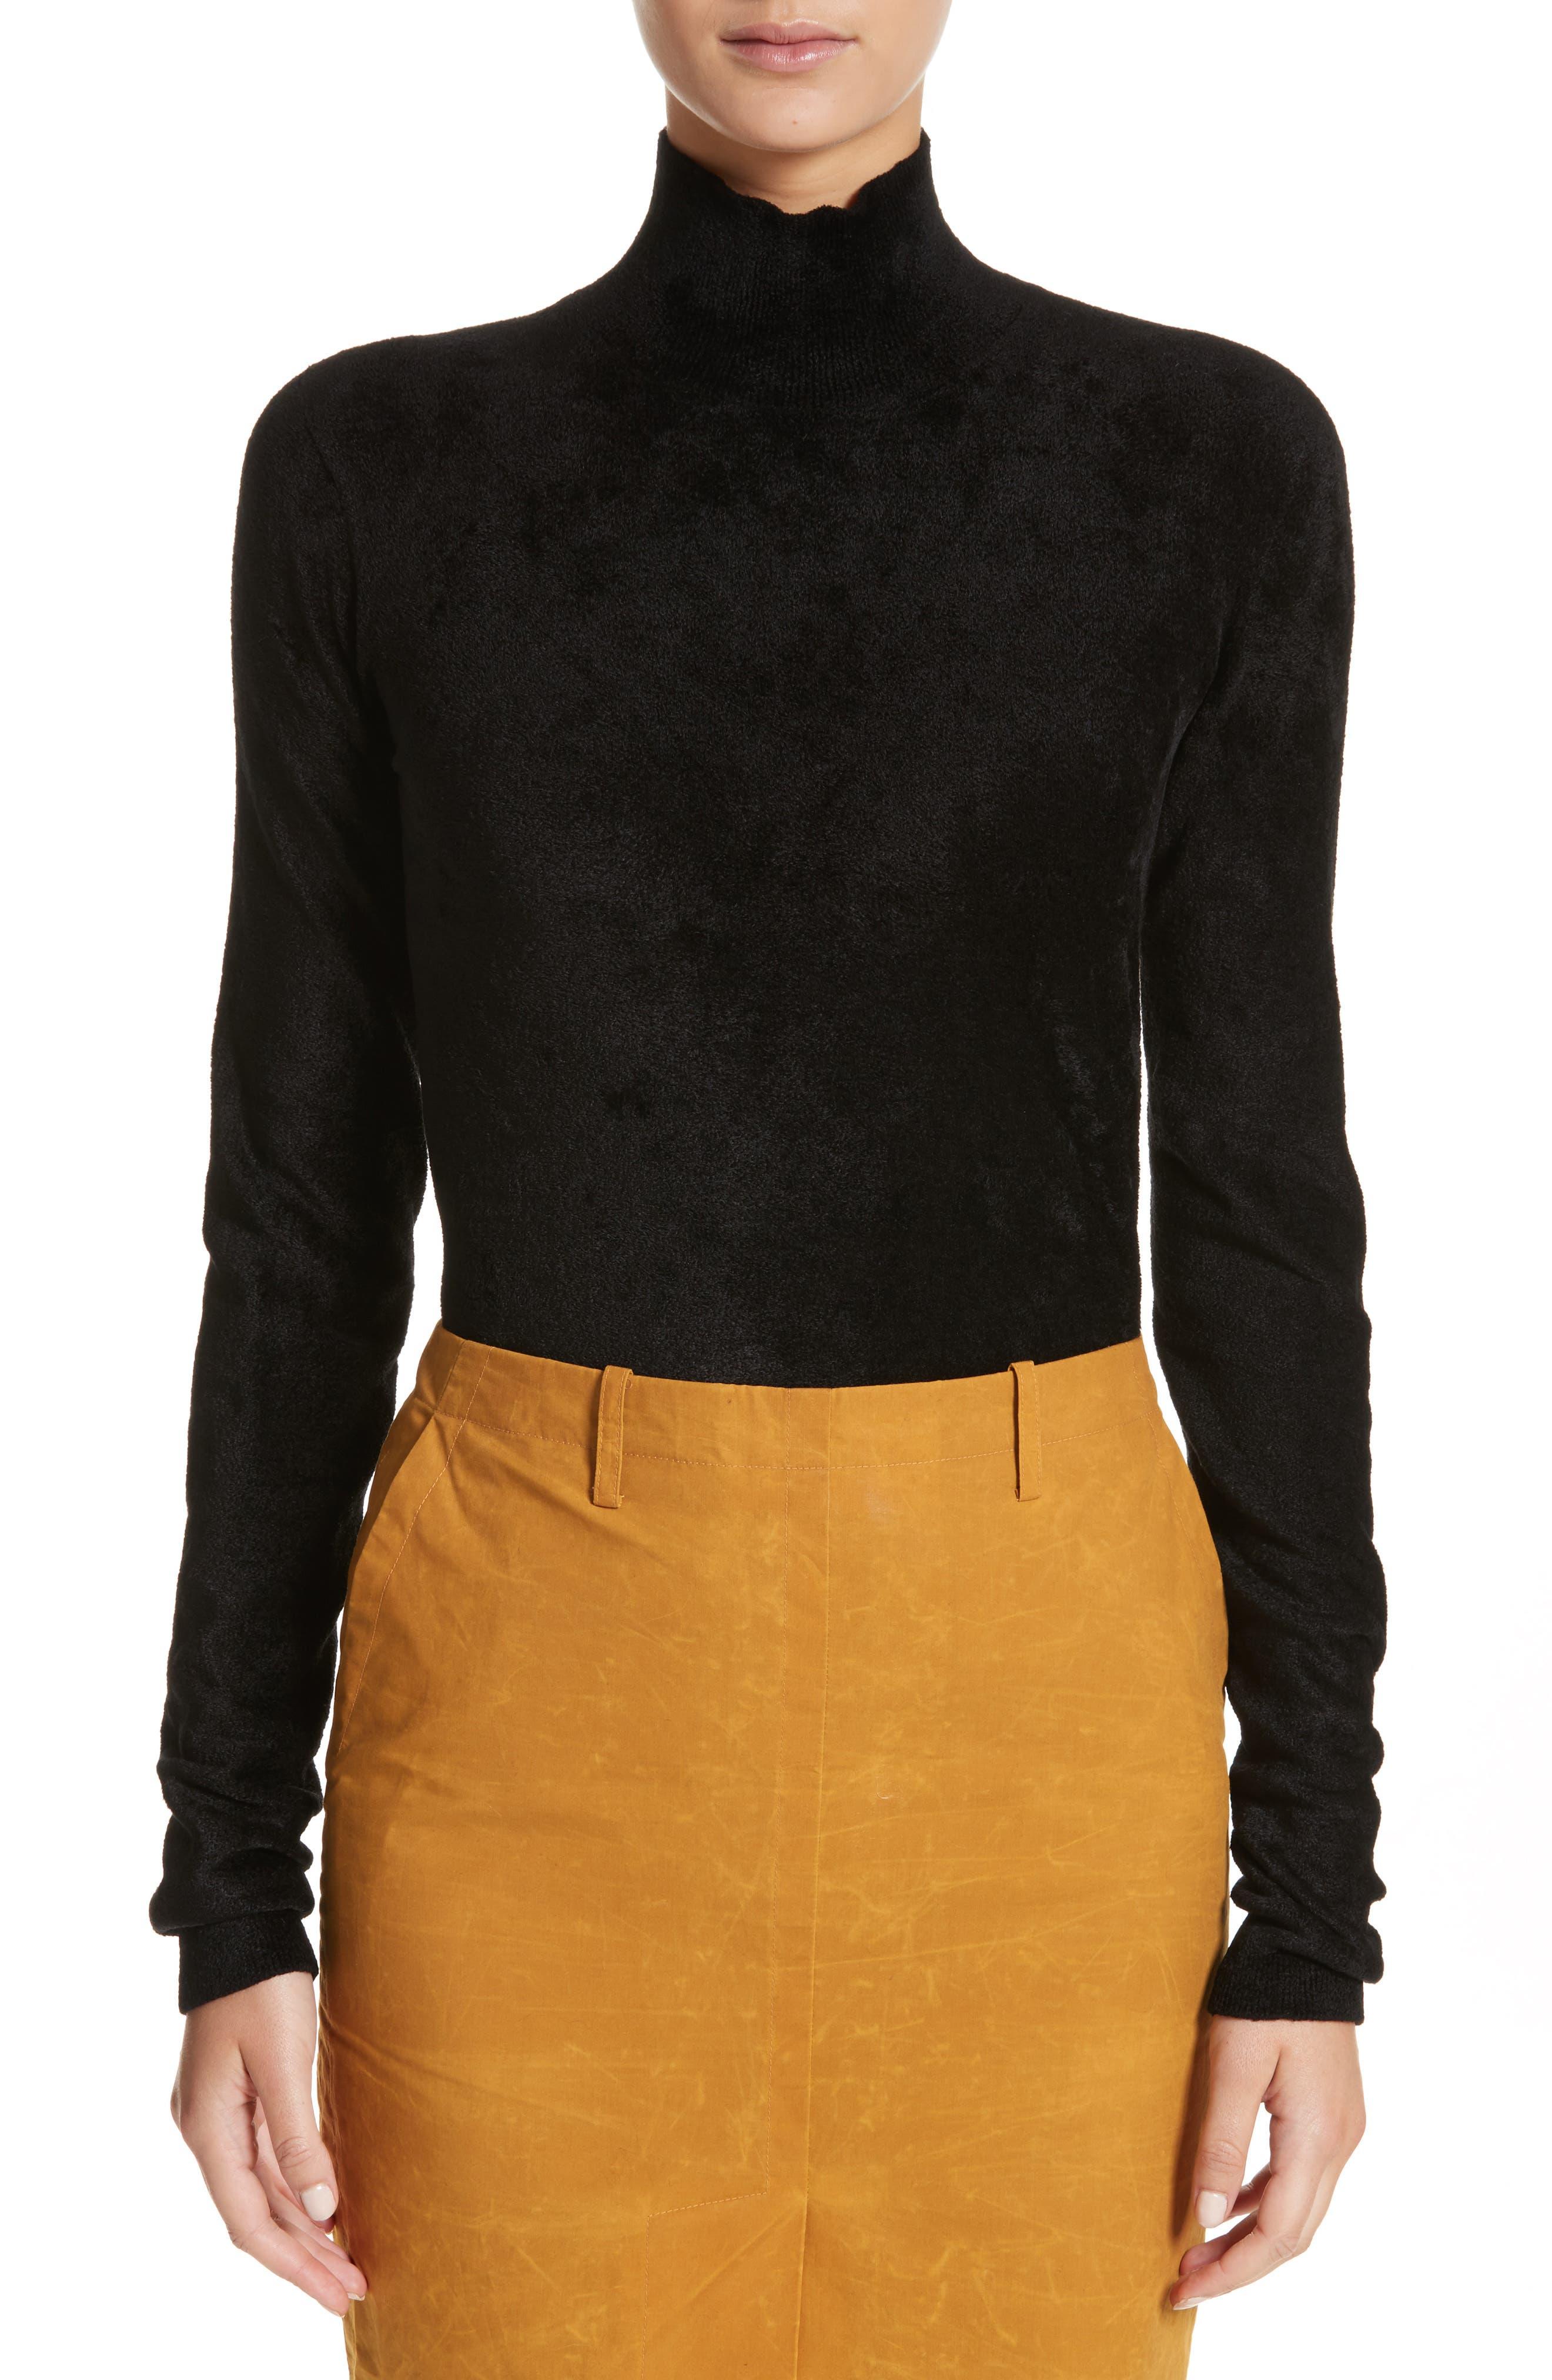 Chenille Turtleneck Sweater,                         Main,                         color, 00N99 Black